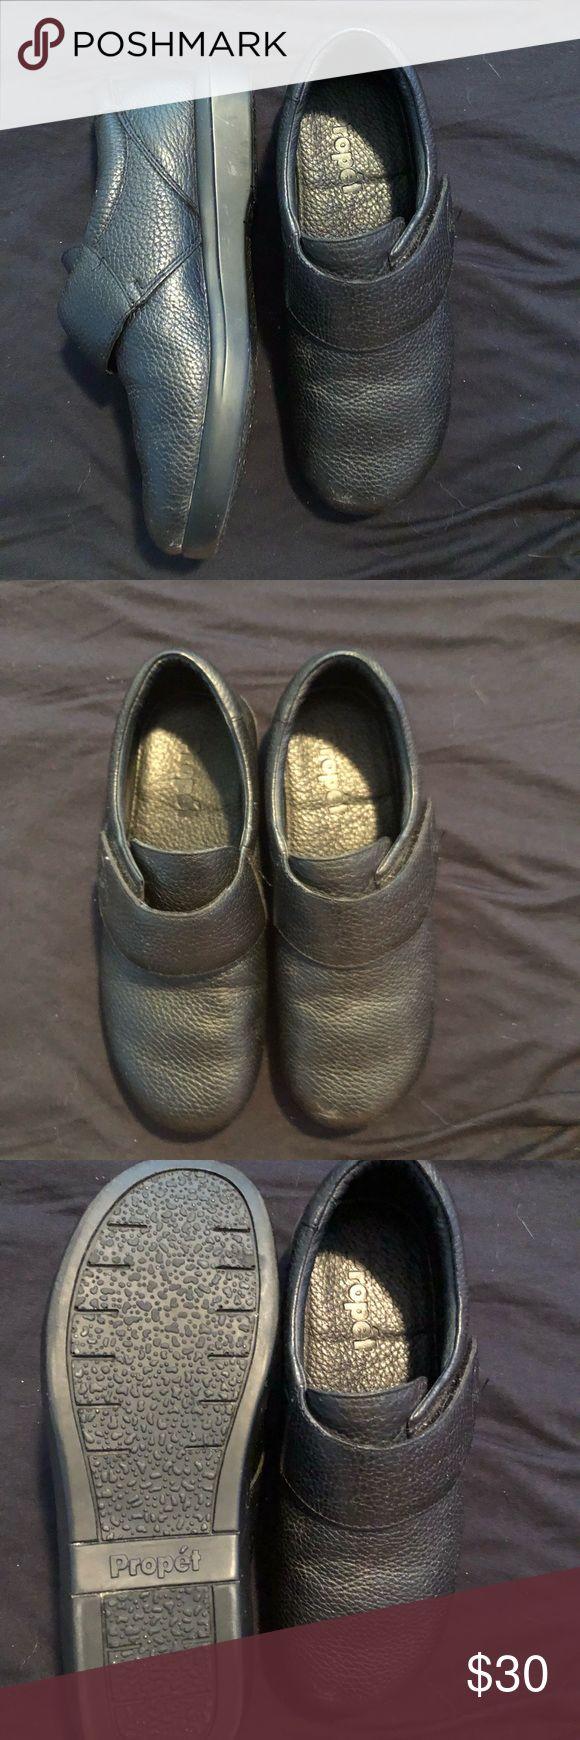 Black Propét Leather Velcro shoes Worn once black propét leather shoes with Velcro Propet Shoes Mules & Clogs